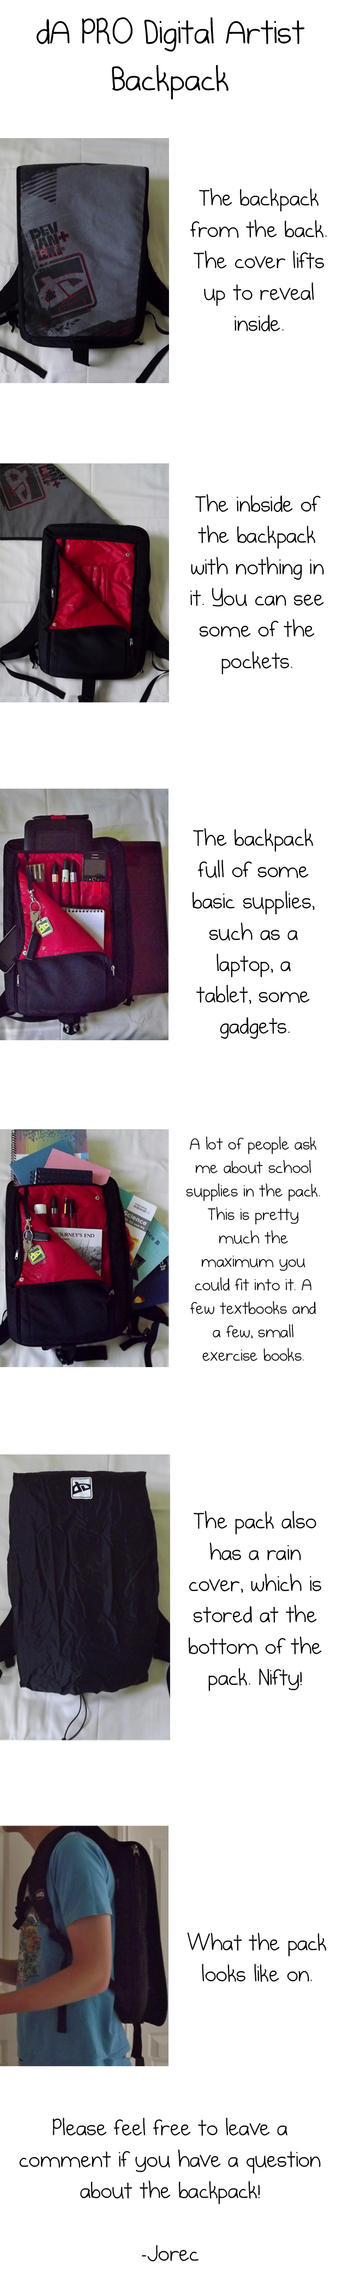 Digital Artist Backpack by Jorec